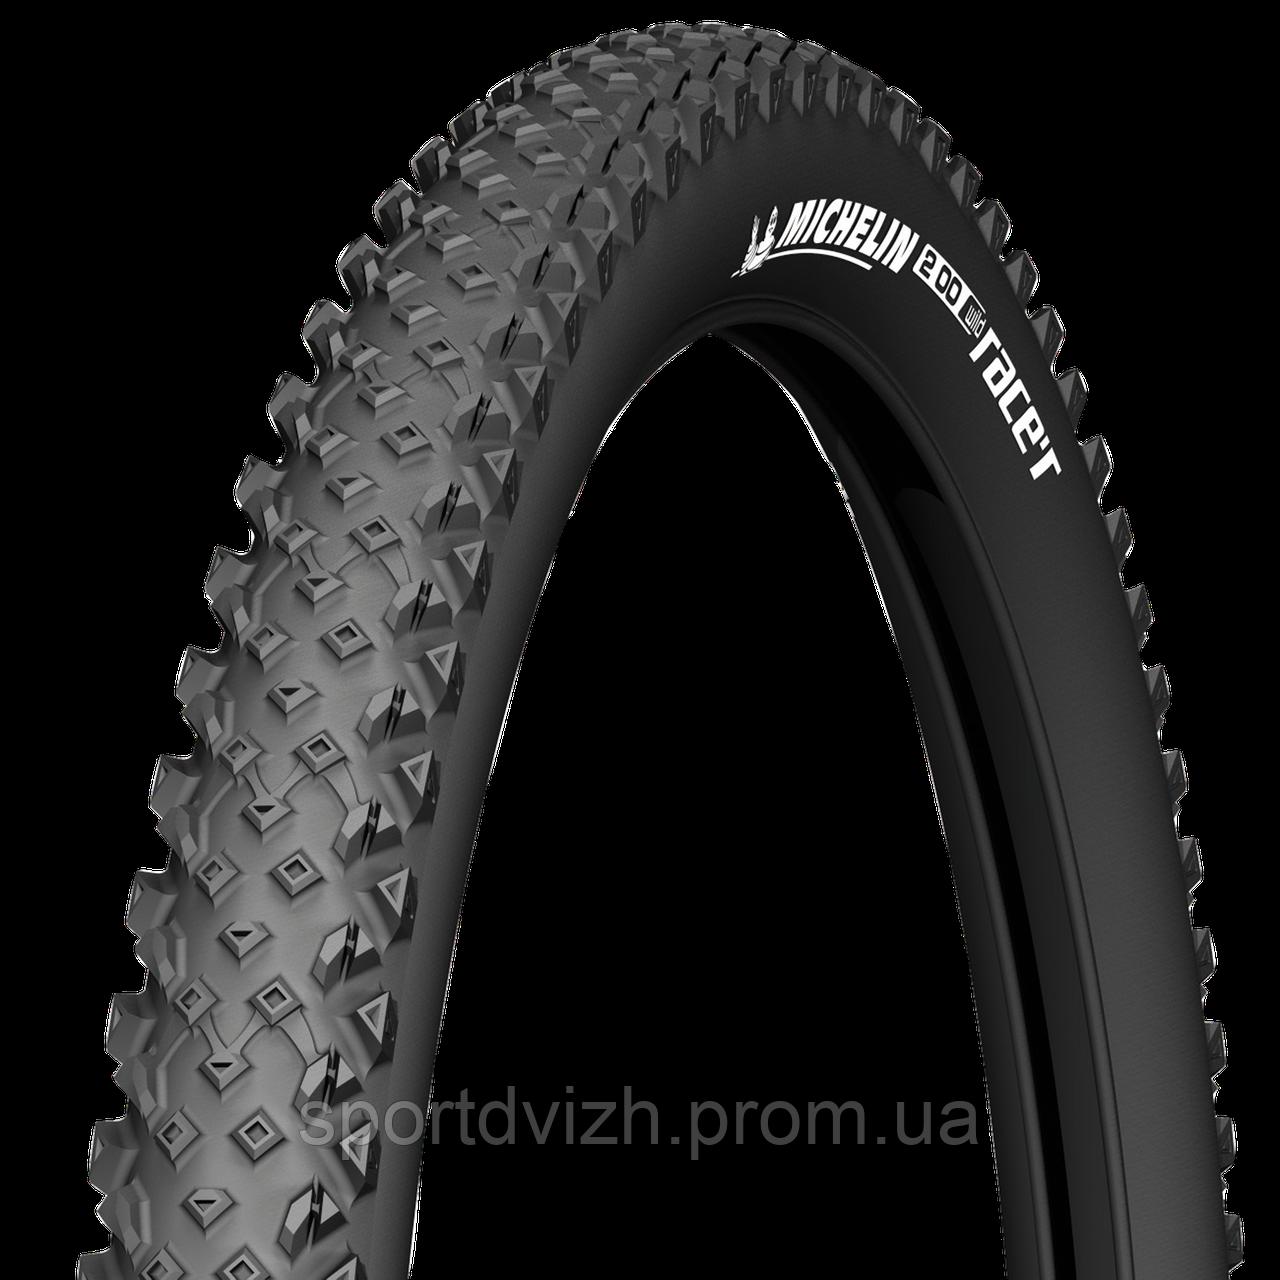 michelin Покрышка Michelin WILD RACER2 TS 29 54-622 (29Х2.10) МТВ, черный 889776